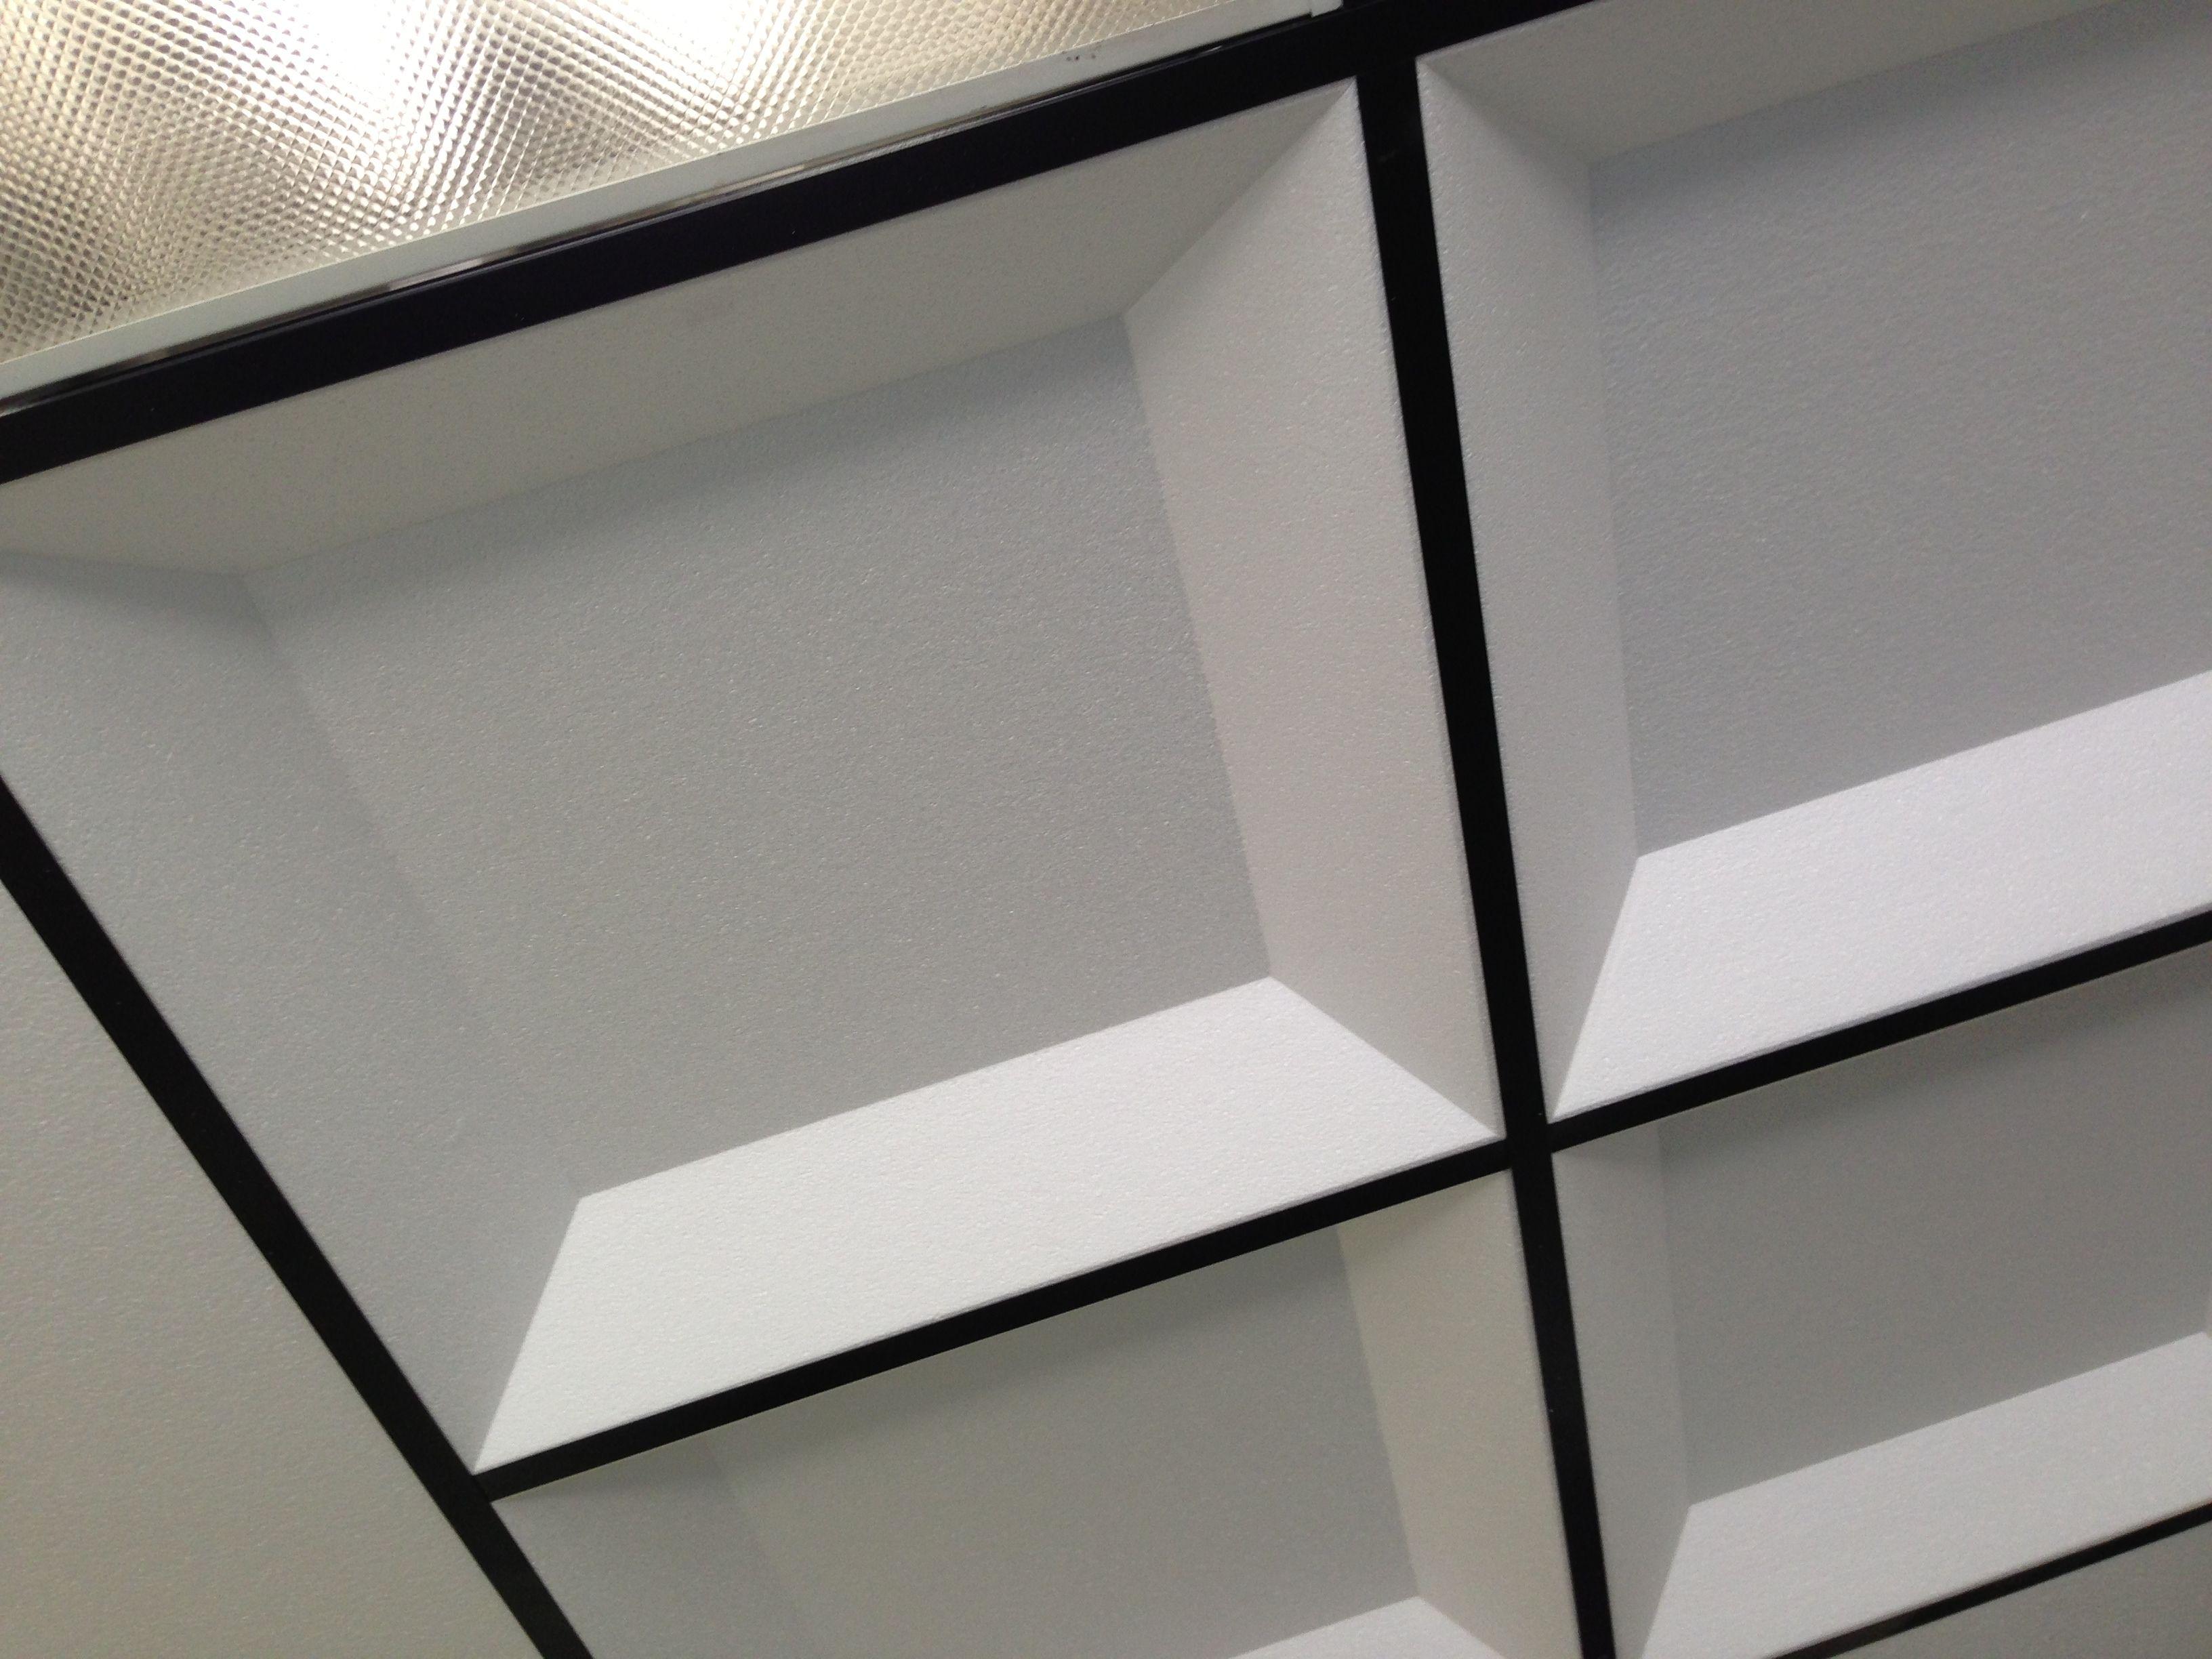 Cool 12X12 Black Ceramic Tile Tiny 2 X4 Ceiling Tiles Solid 20 X 20 Floor Tile Patterns 200X200 Floor Tiles Youthful 3X6 Glass Subway Tile Backsplash Orange4 X 12 Glass Subway Tile Creativechairsandtables.com ..